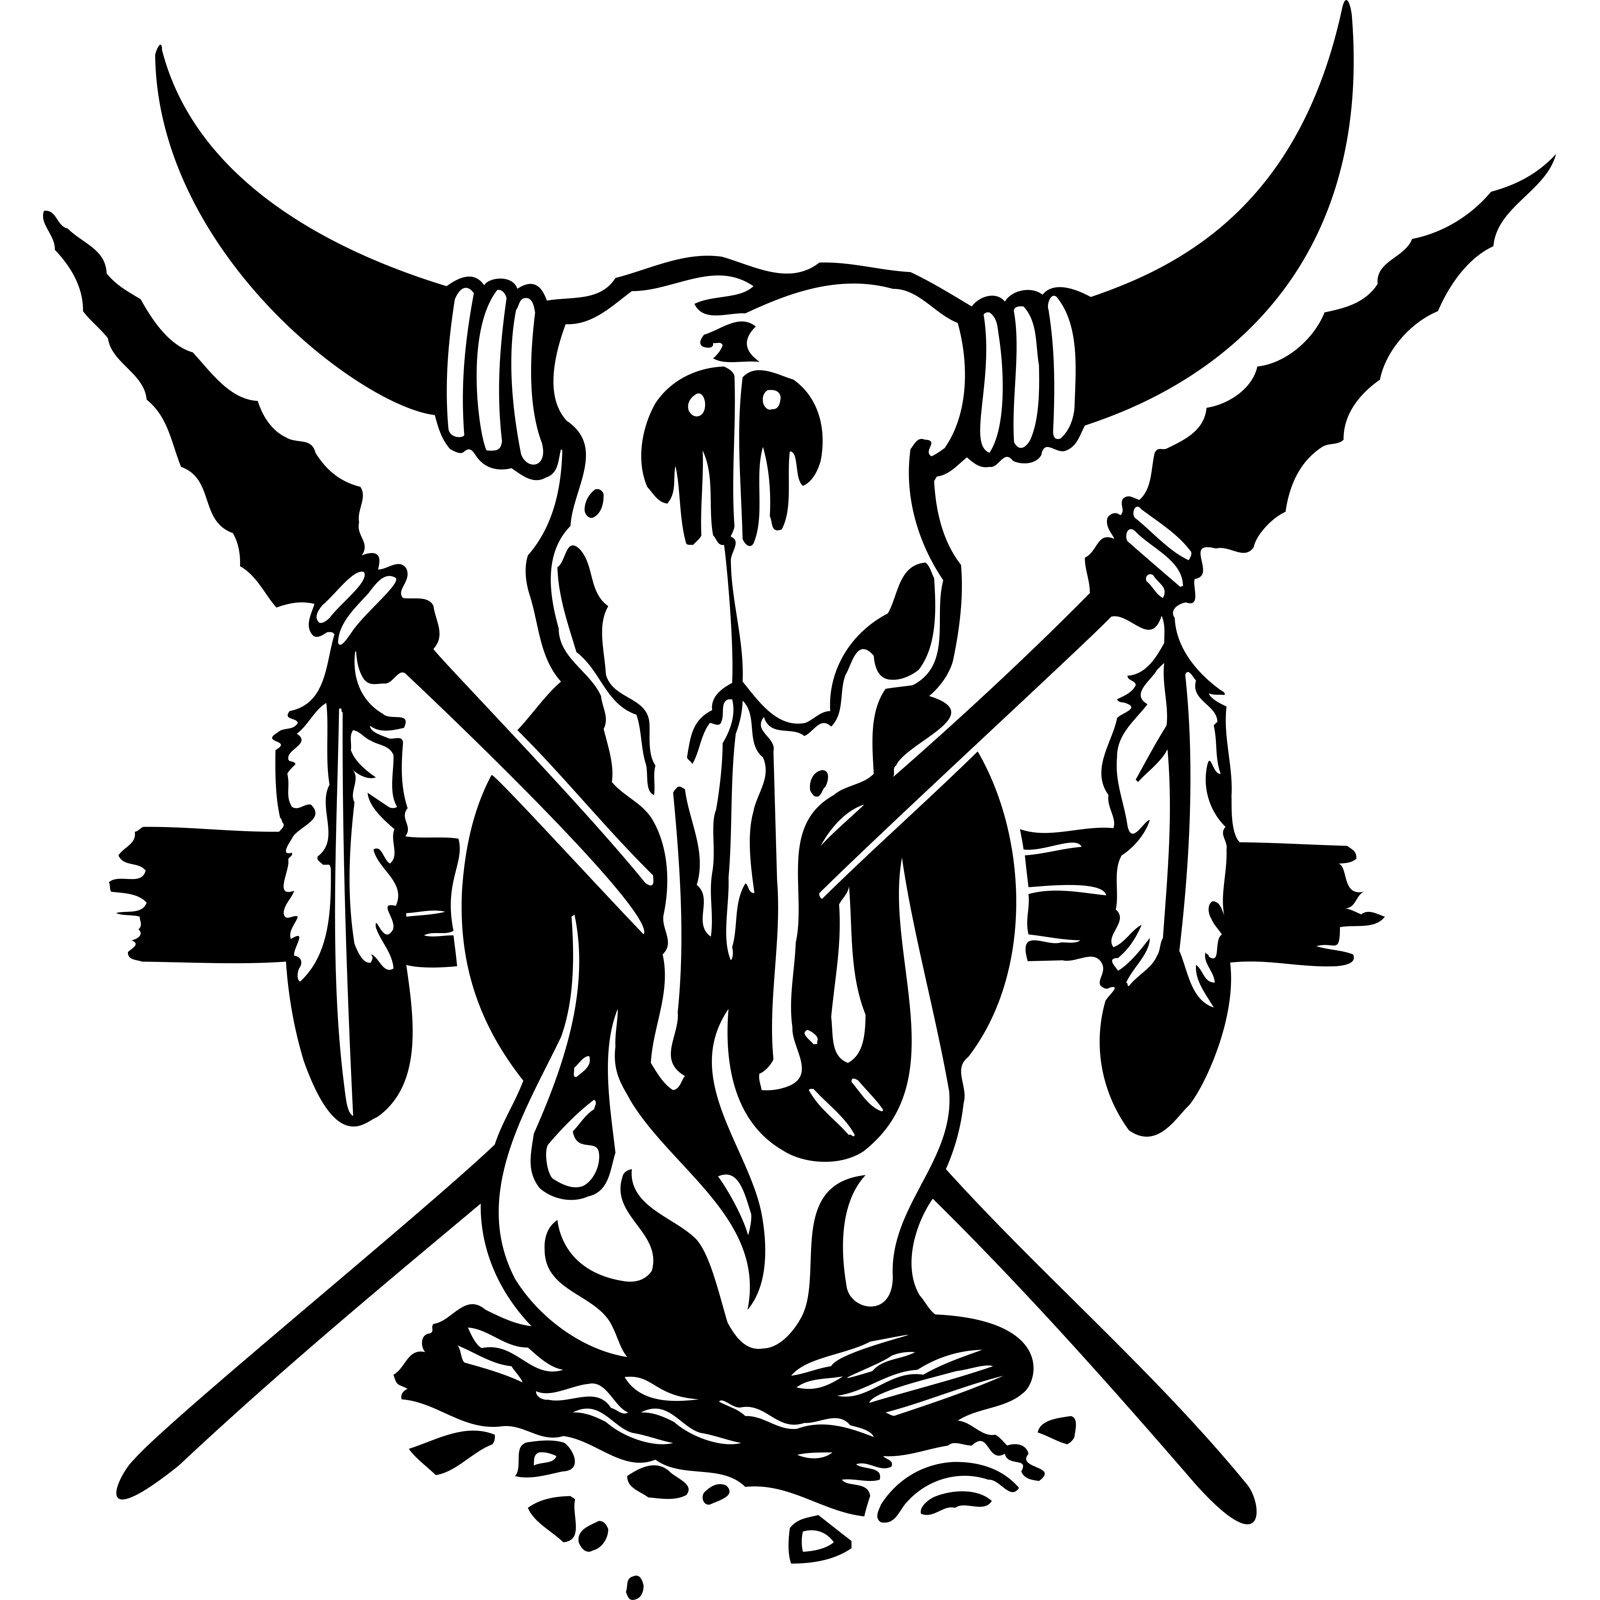 Mirrored Wall Art Stickers Buffalo Skull Cross Spears Native American Indian Wall